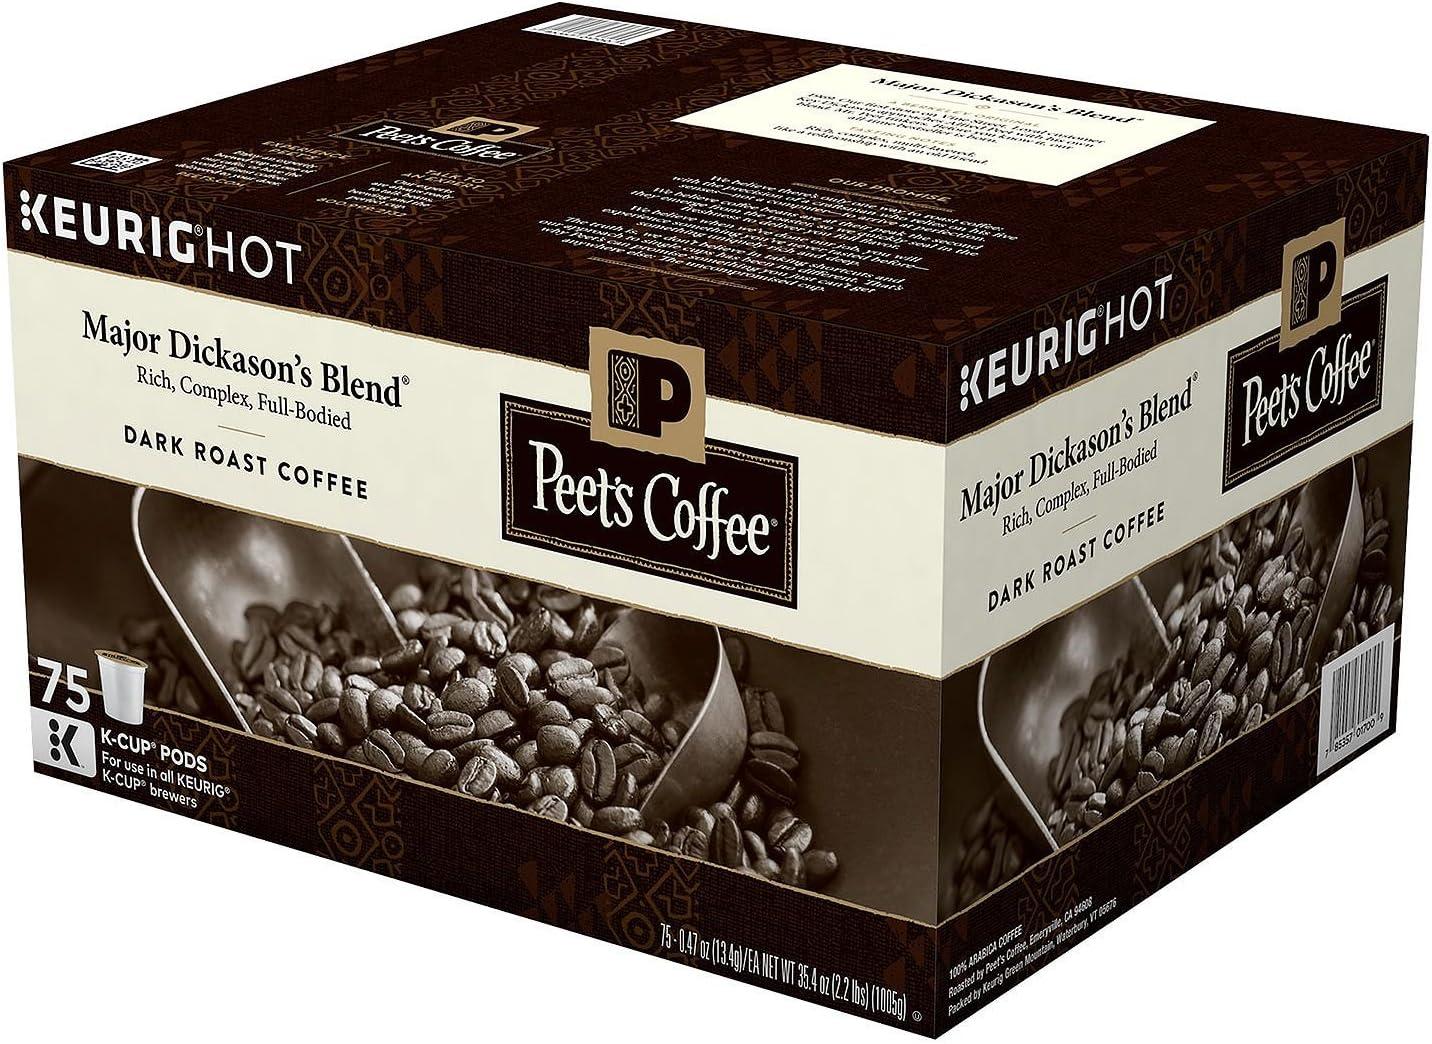 Peet's Coffee Major Dickason's Blend, Dark Roast (75 K-Cups)